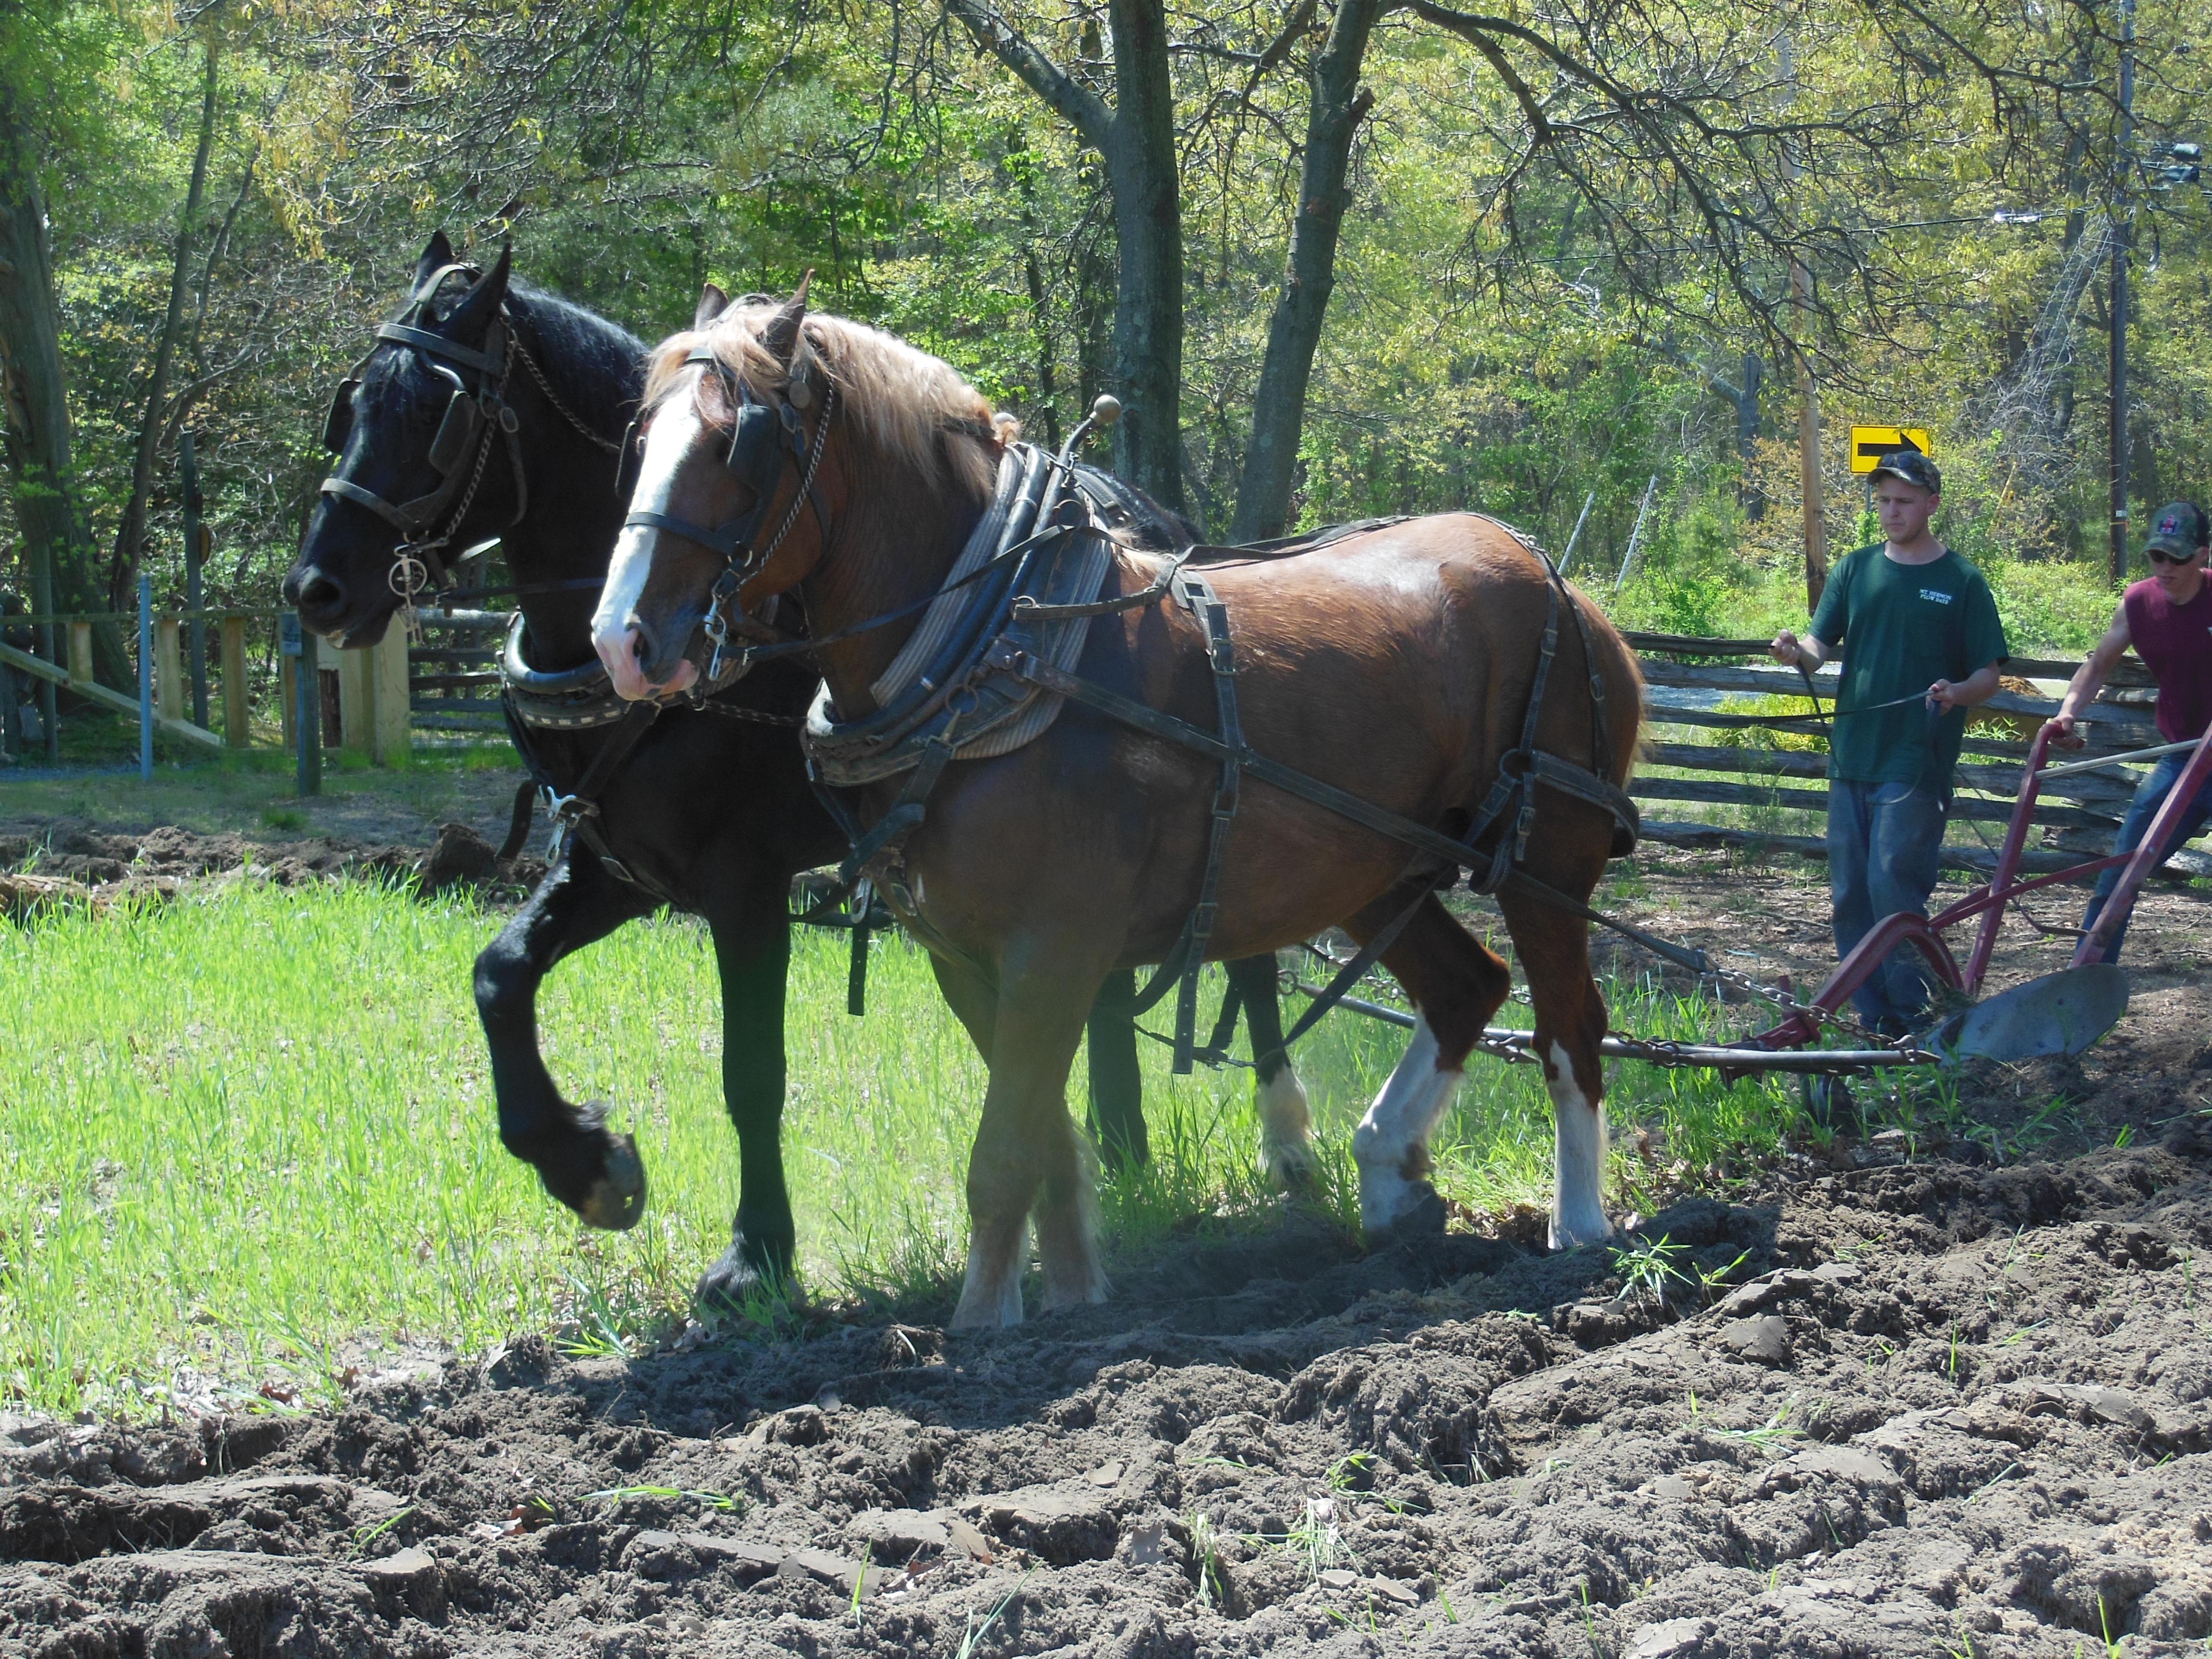 Plowing 2015